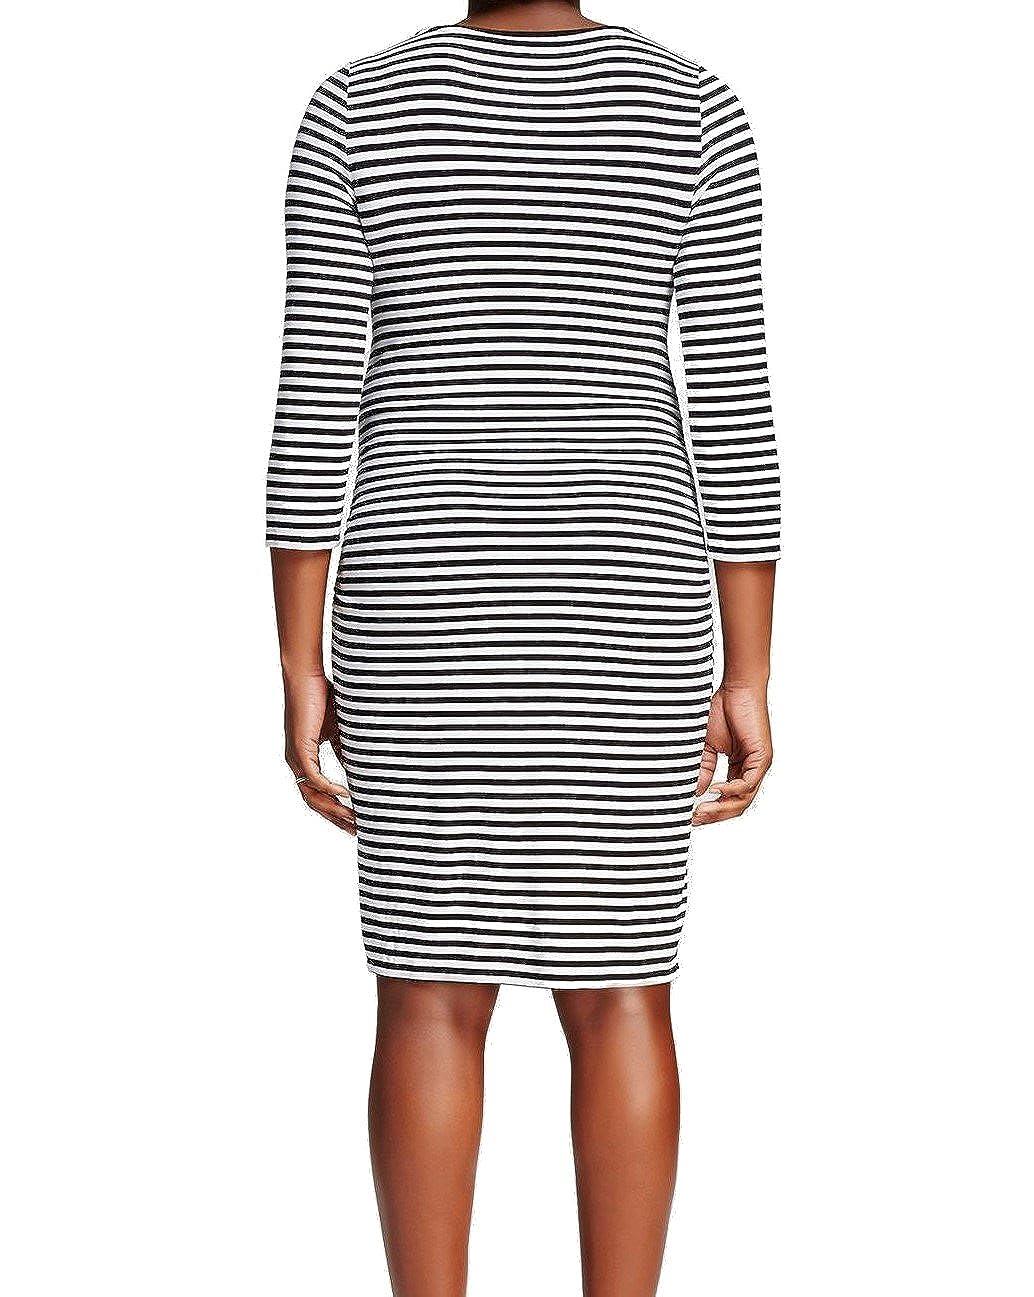 bd01fa46693bd Liz Lange Maternity 3/4 Sleeve T Shirt Dress, Navy/Cream Medium at Amazon  Women's Clothing store: